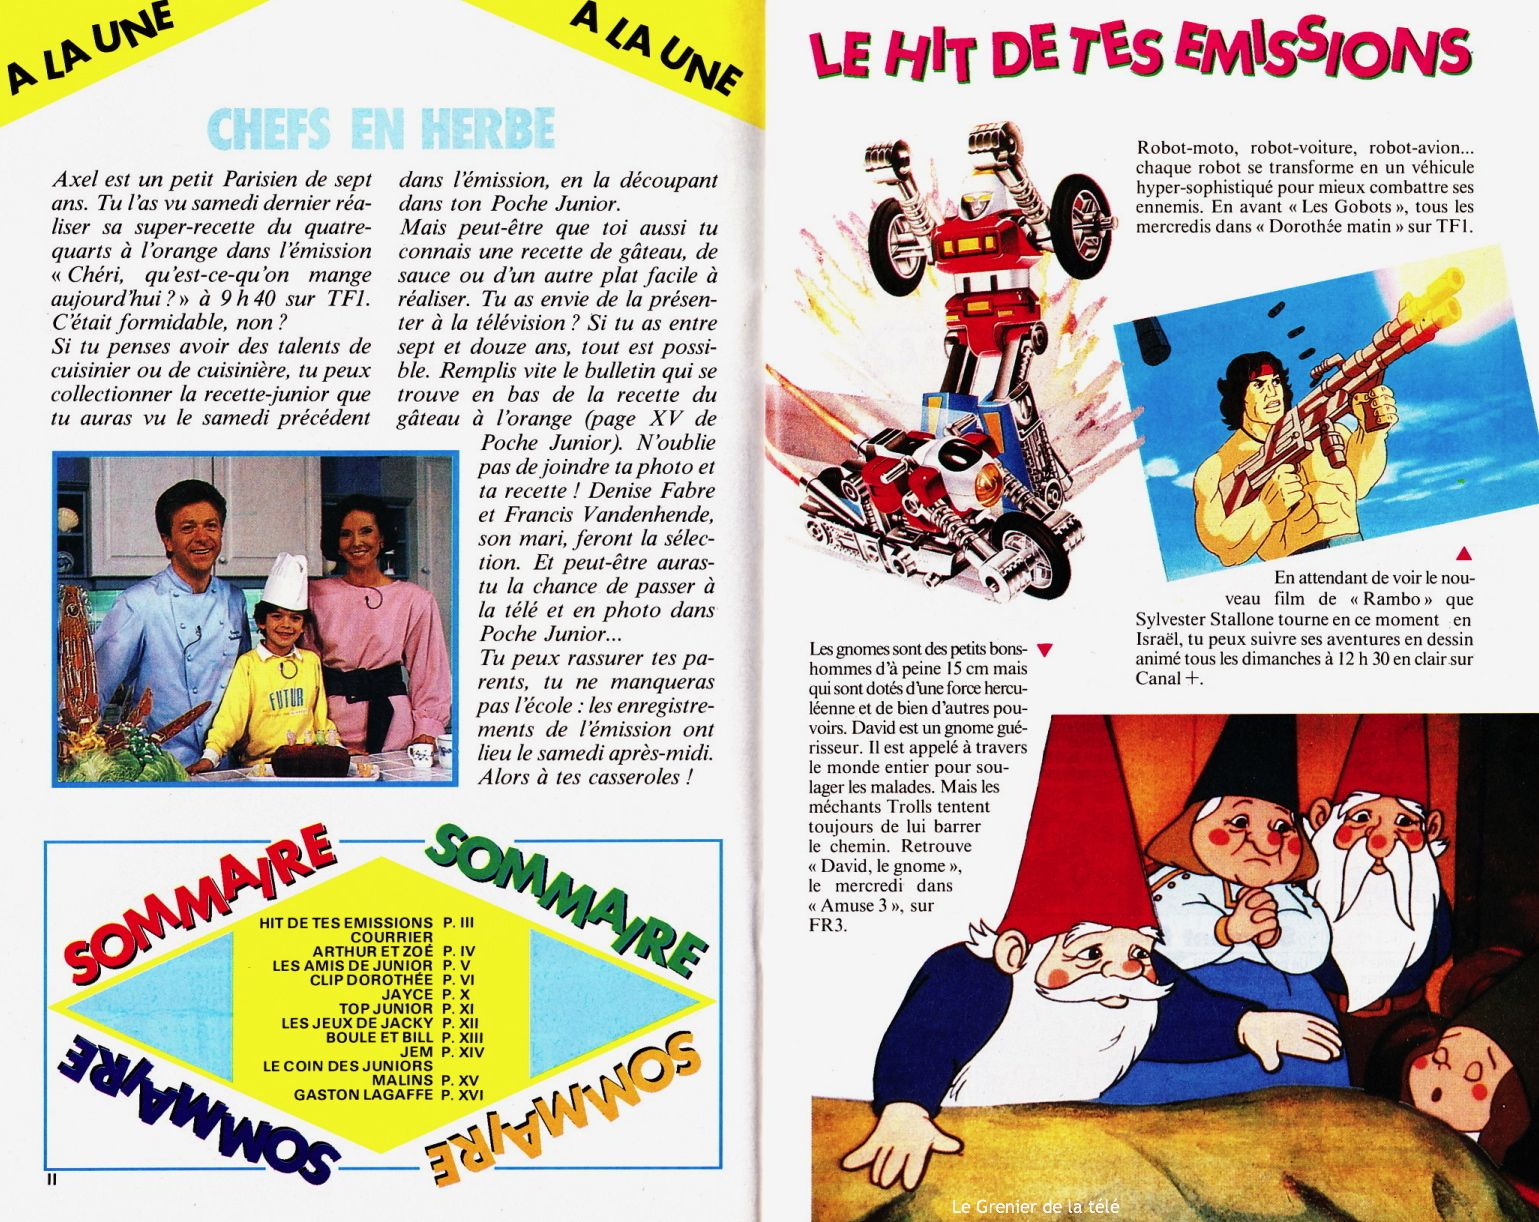 http://grenierdelatv.free.fr/2/pochejunior24oct198702.jpg